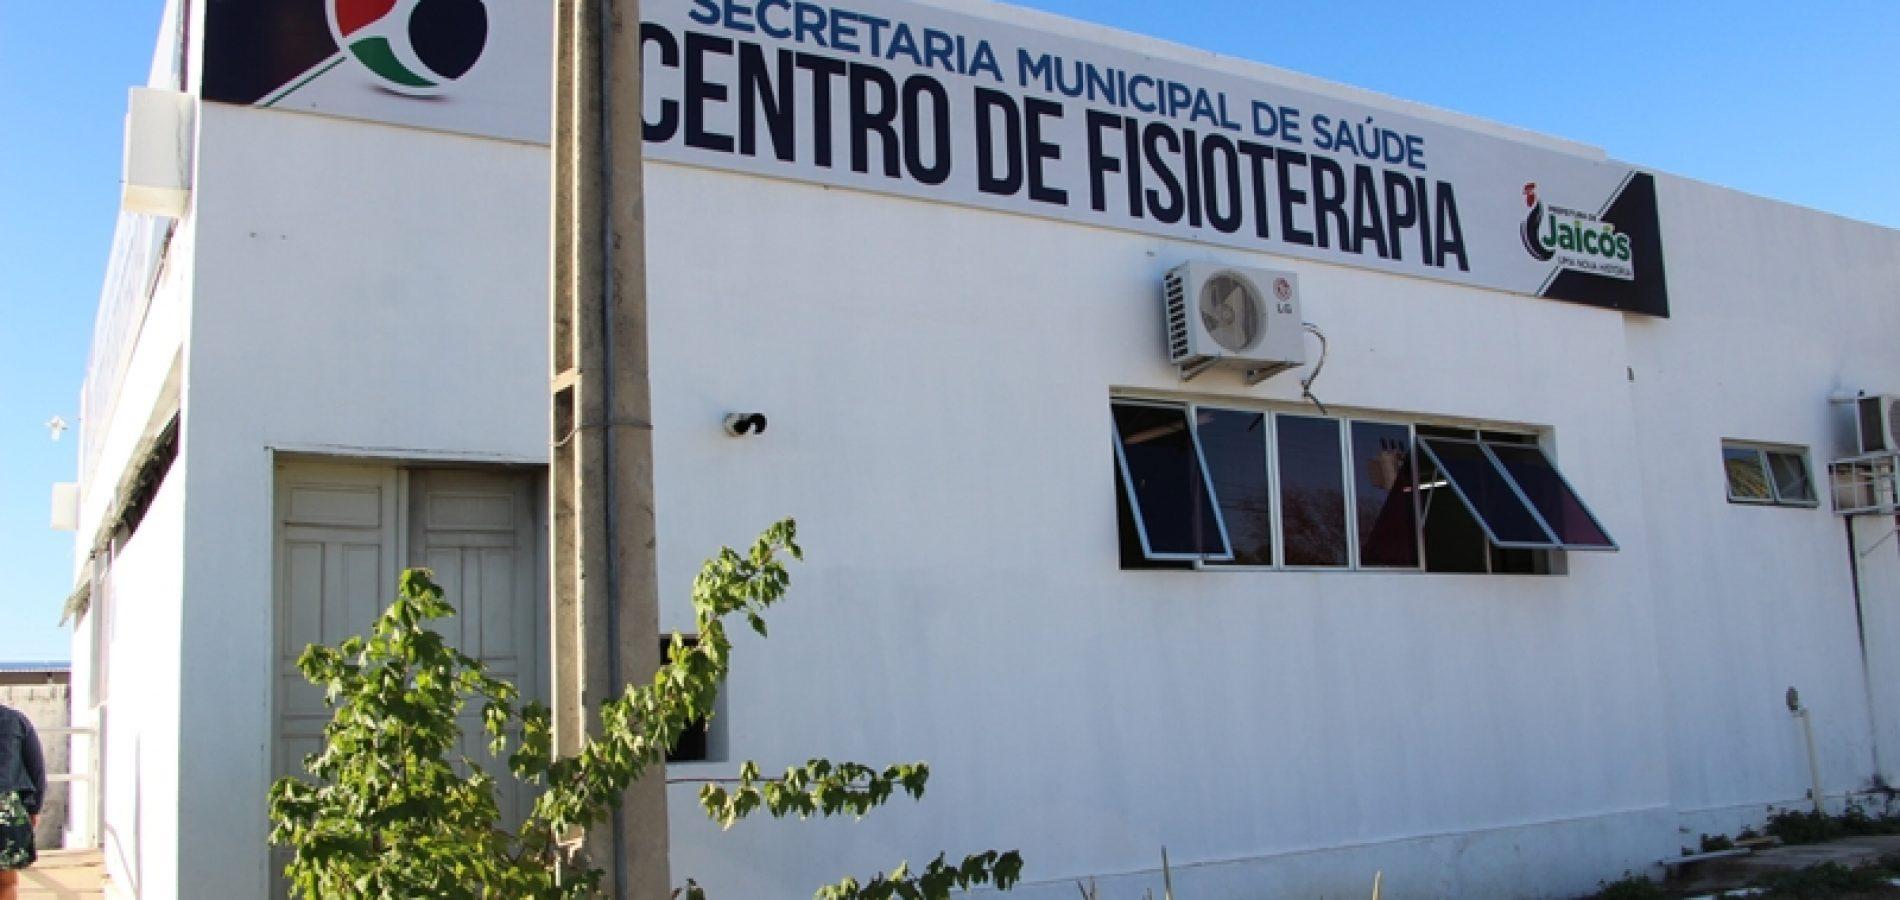 Centro de Fisioterapia de Jaicós retoma atendimentos